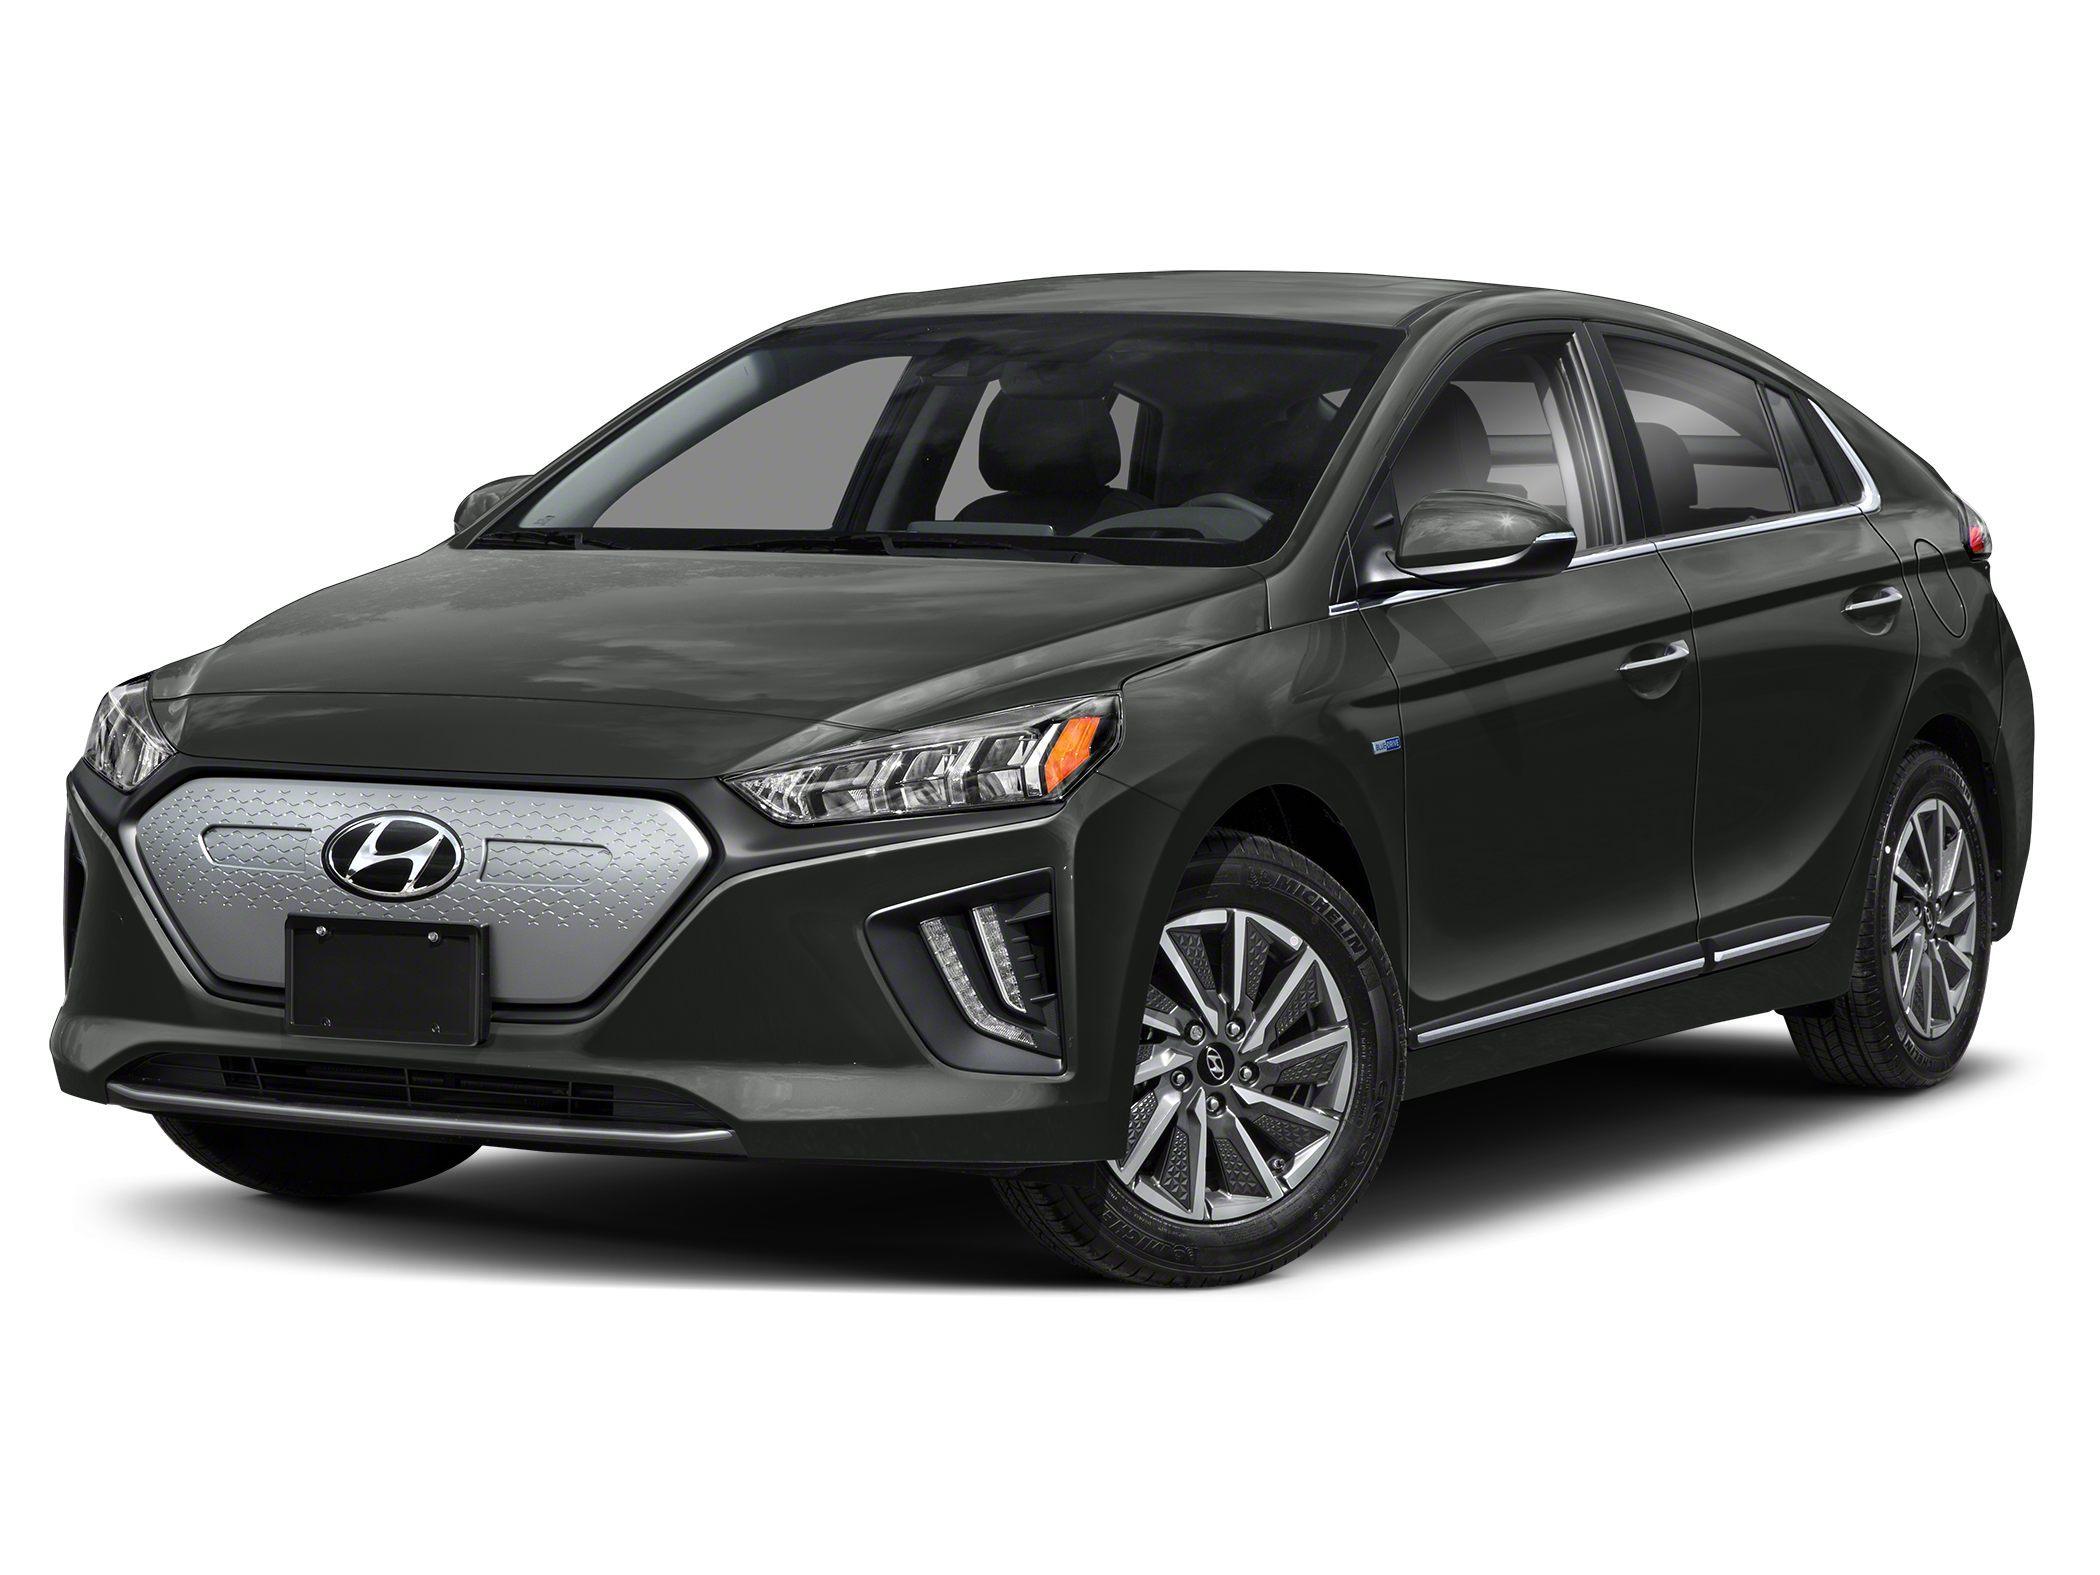 2020 Hyundai Ioniq EV Hatchback